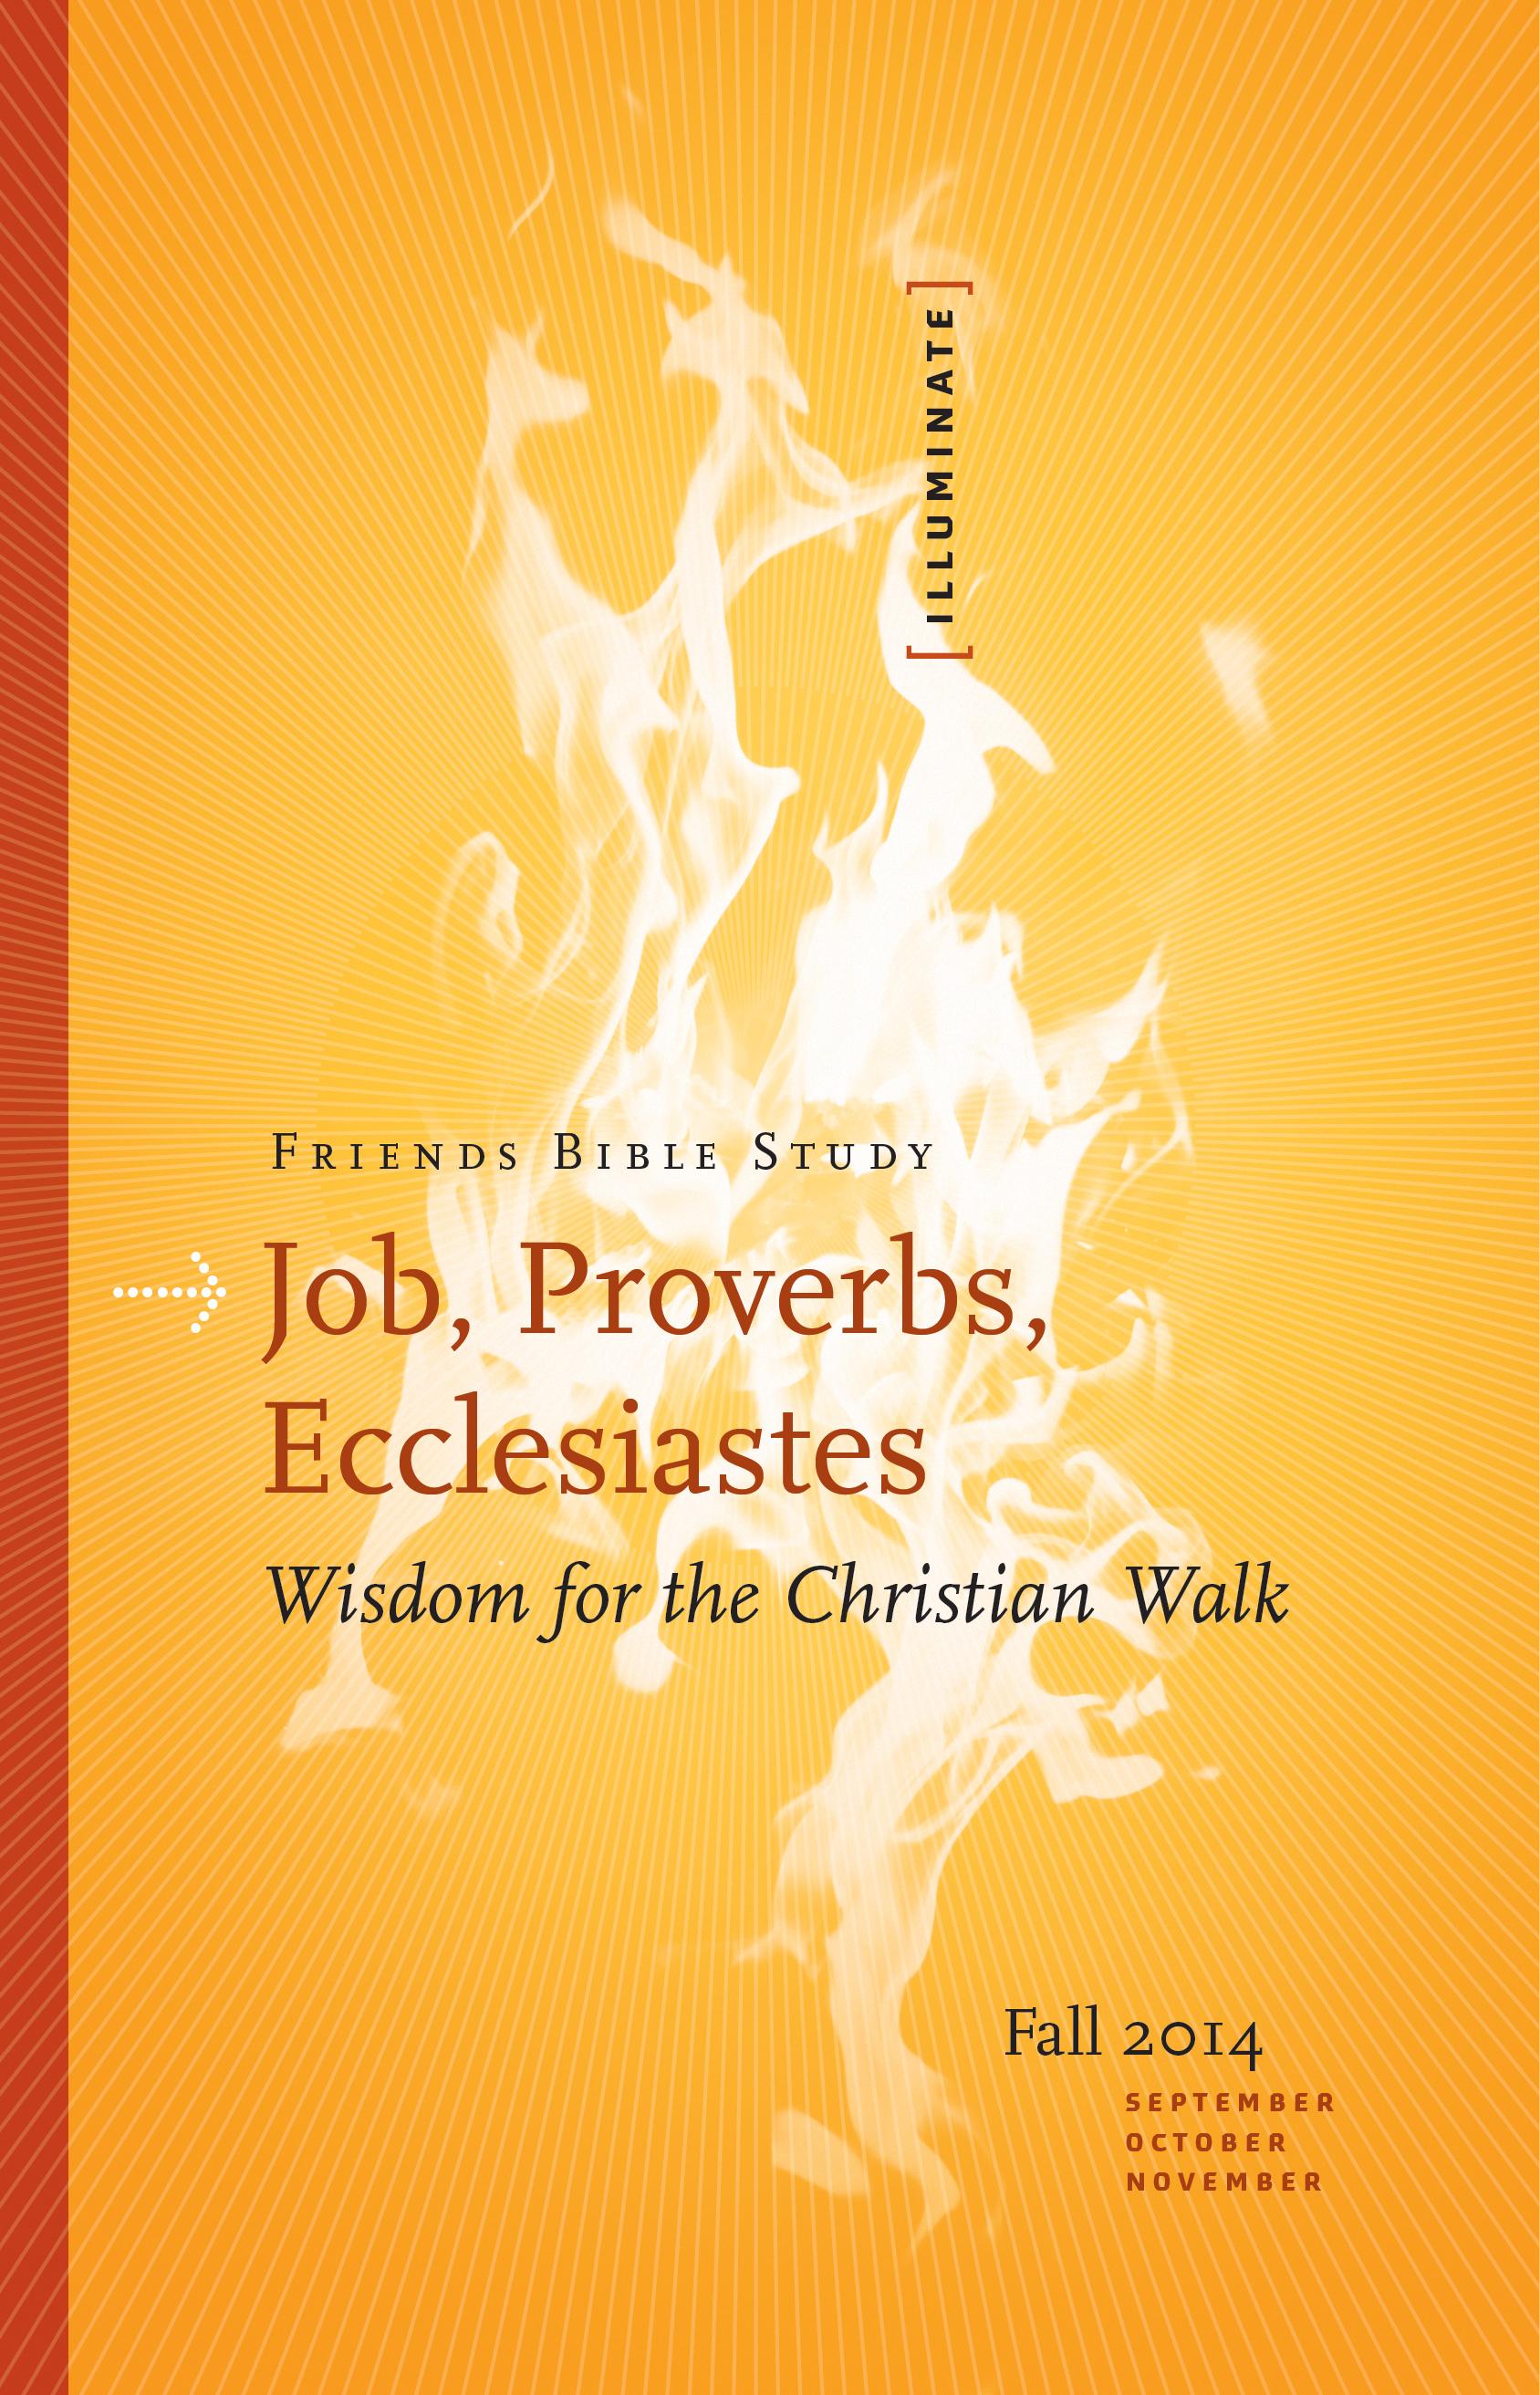 Job, Proverbs, Ecclesiastes